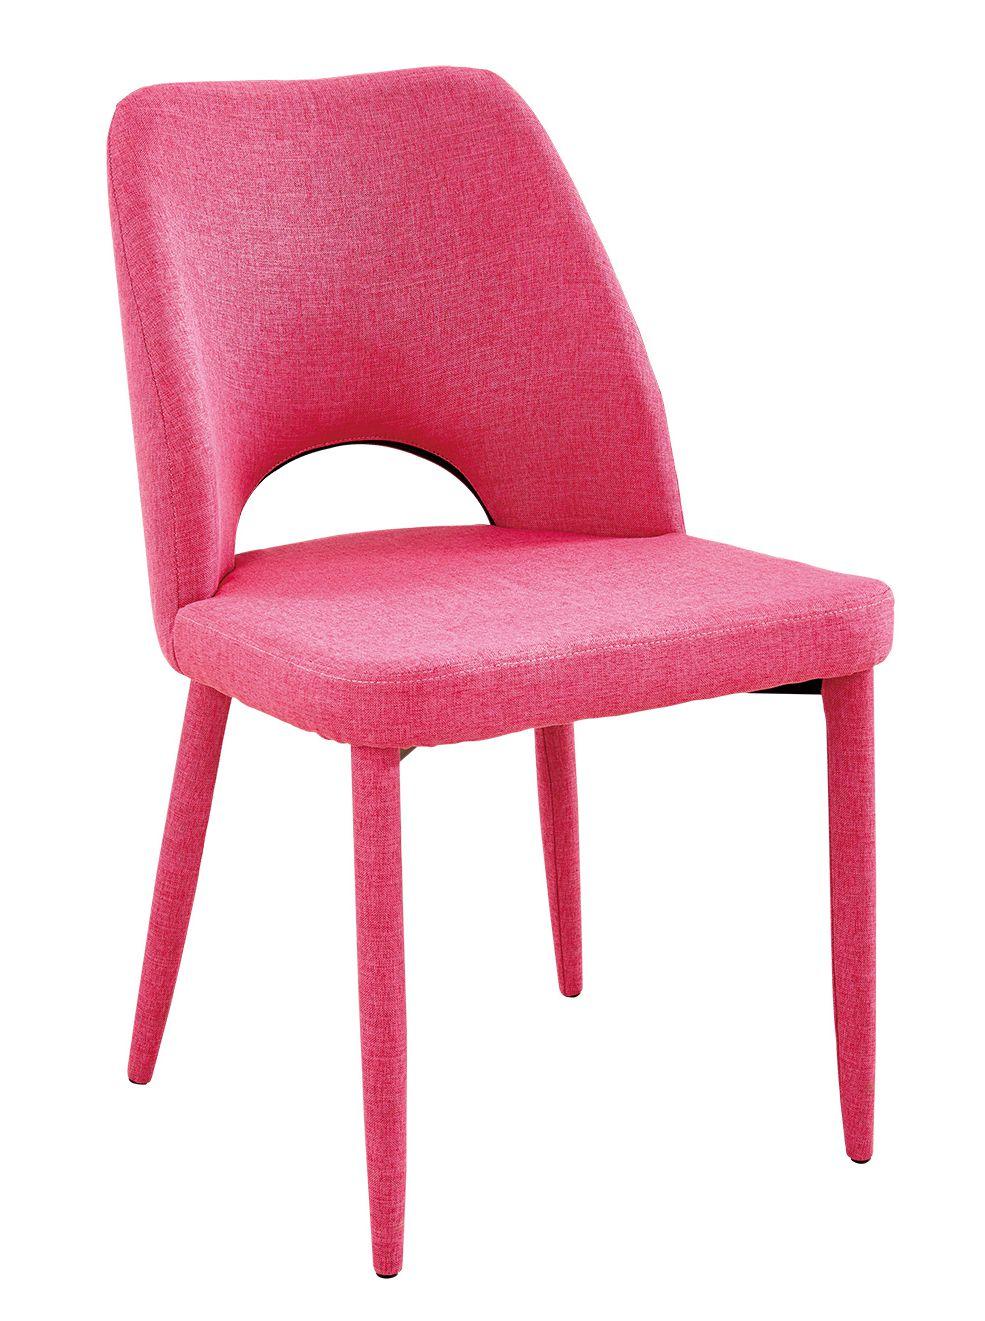 2016 new design cheap fabric dining chair mc08 buy